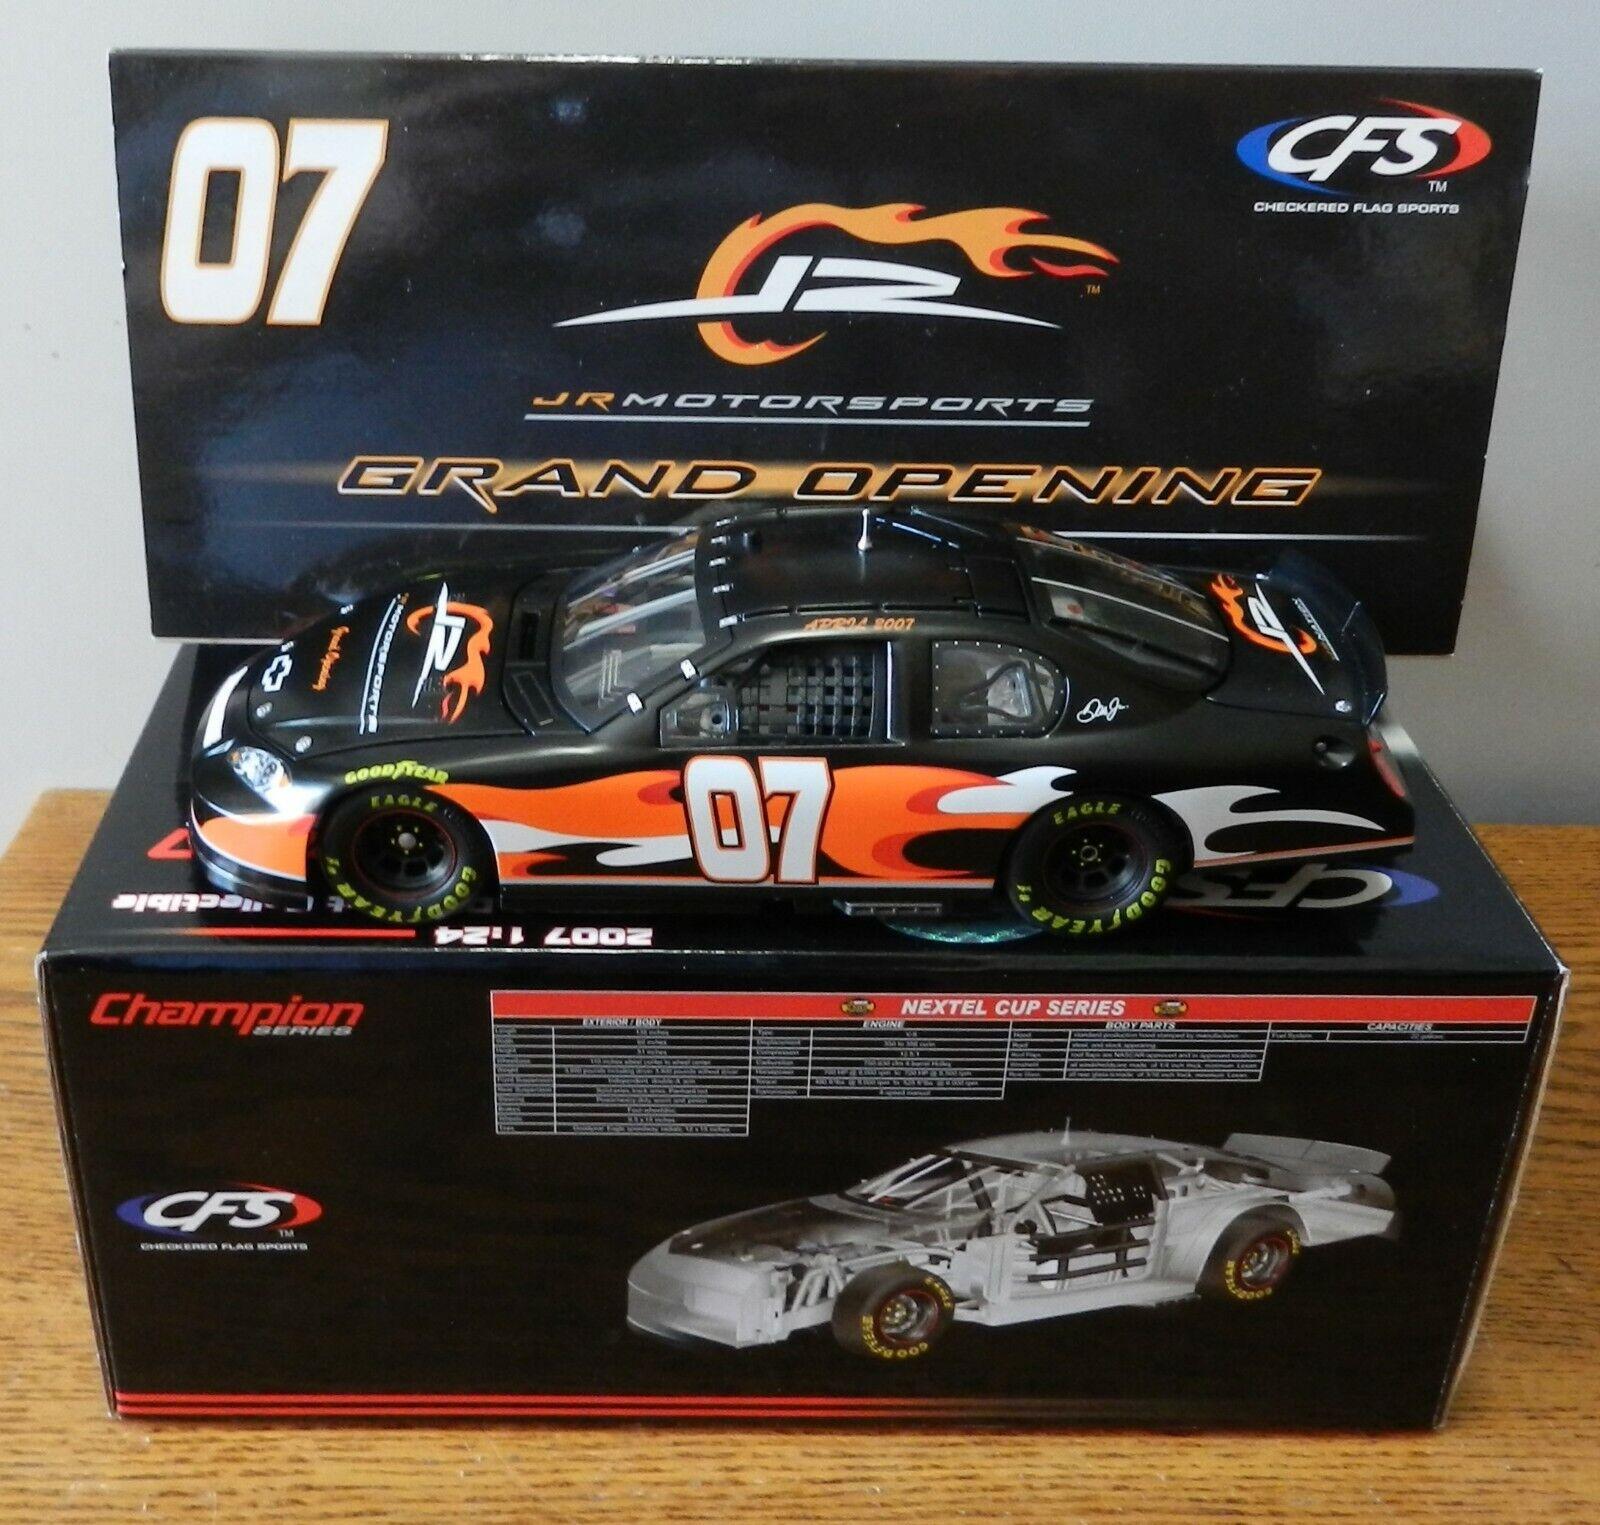 2007 Dale Earnhardt Jr  7  inauguración  CFS coche edición limitada 1 de 3883